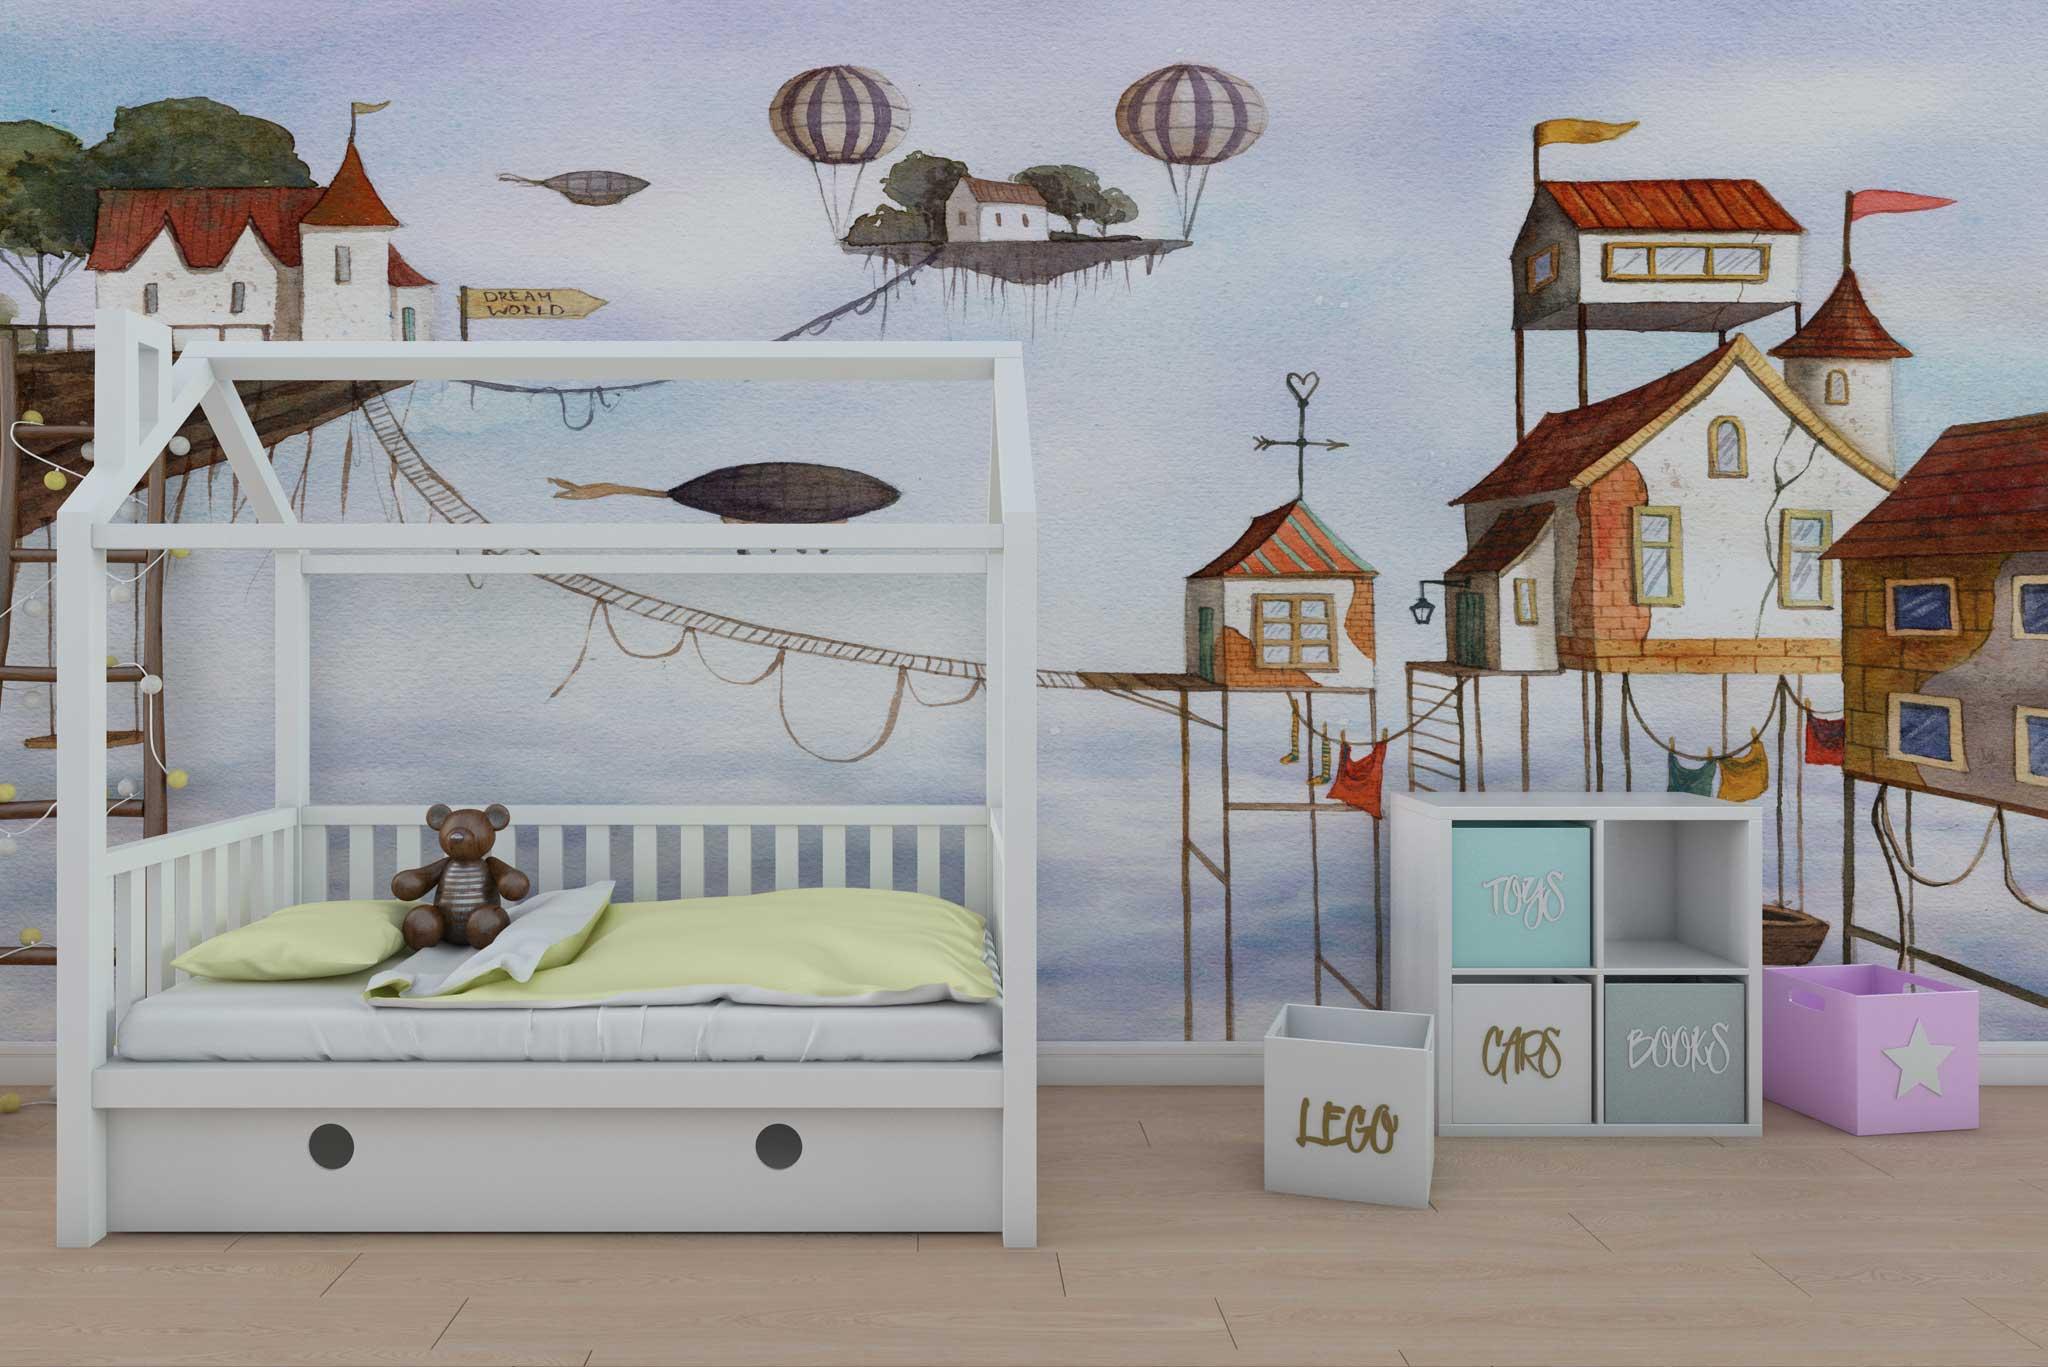 http://daringprints.ro/wp-content/uploads/2020/12/taoet-fototapet-special-personalizat-comanda-bucuresti-camera-dormitor-copii-perete-pat-design-interior-case-casute-poveste-fantastic-imaginatie-calatorie.jpg